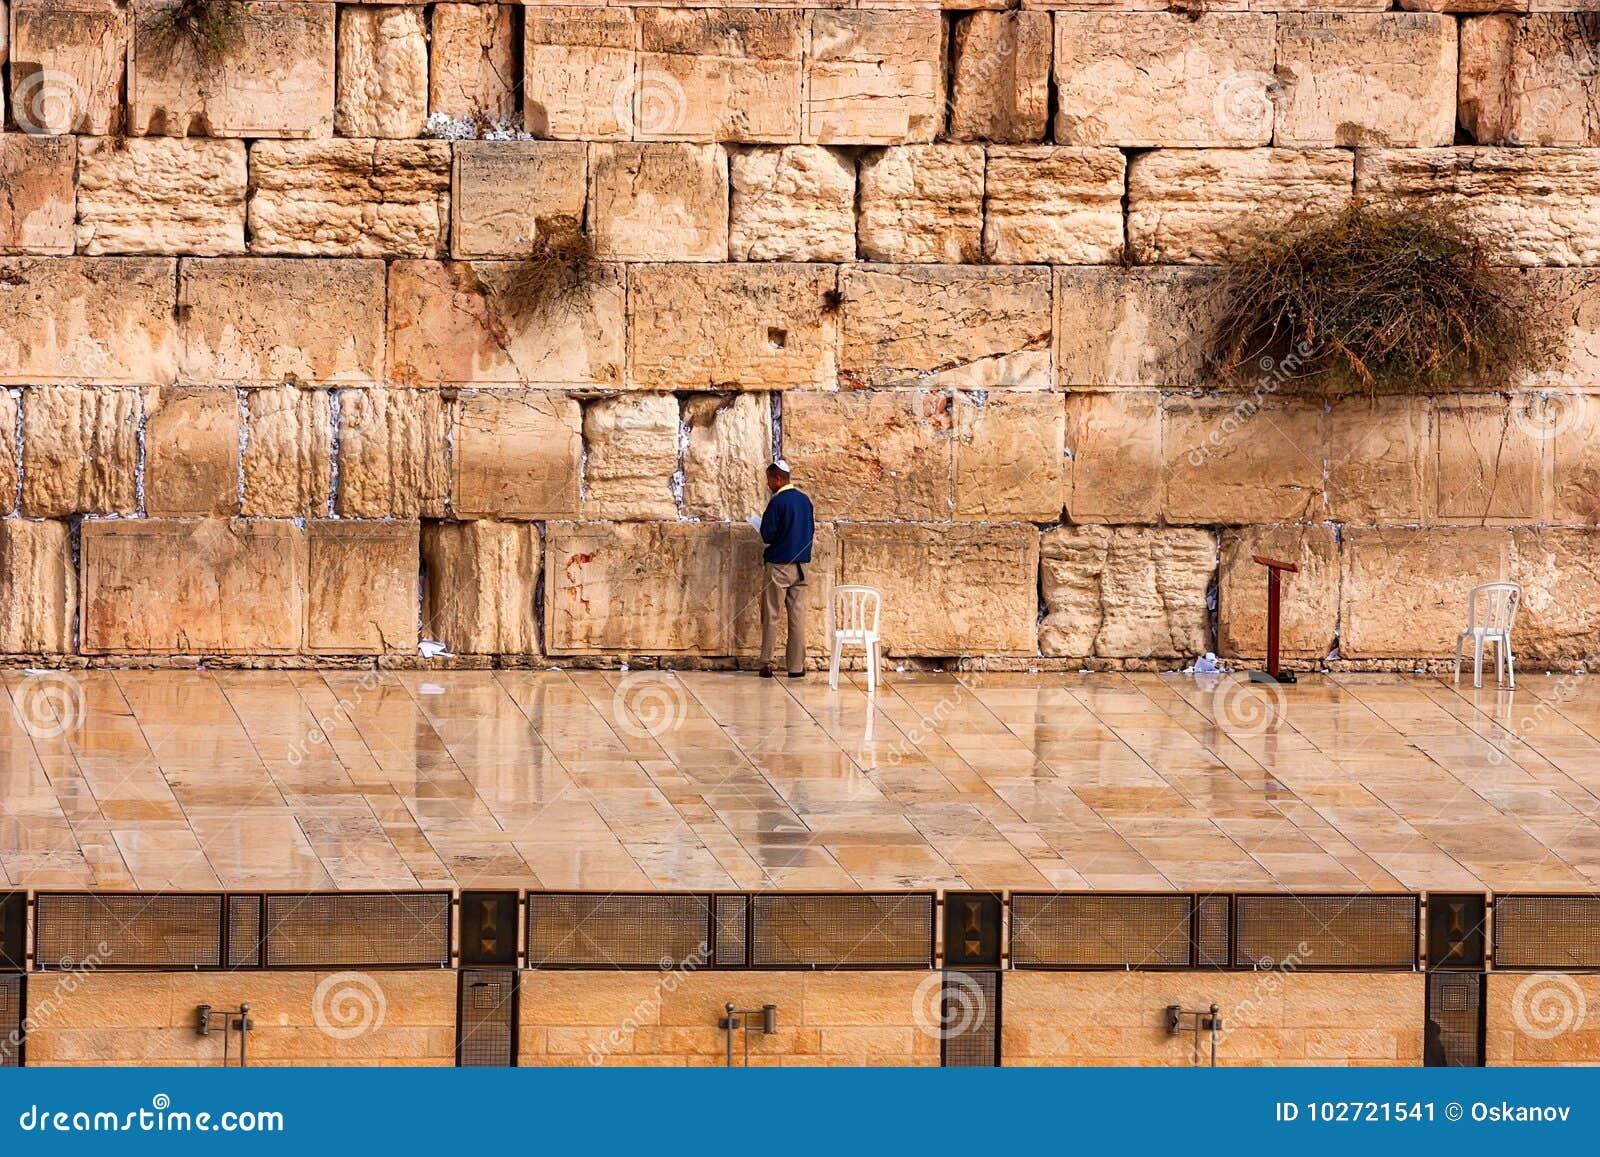 Israel November